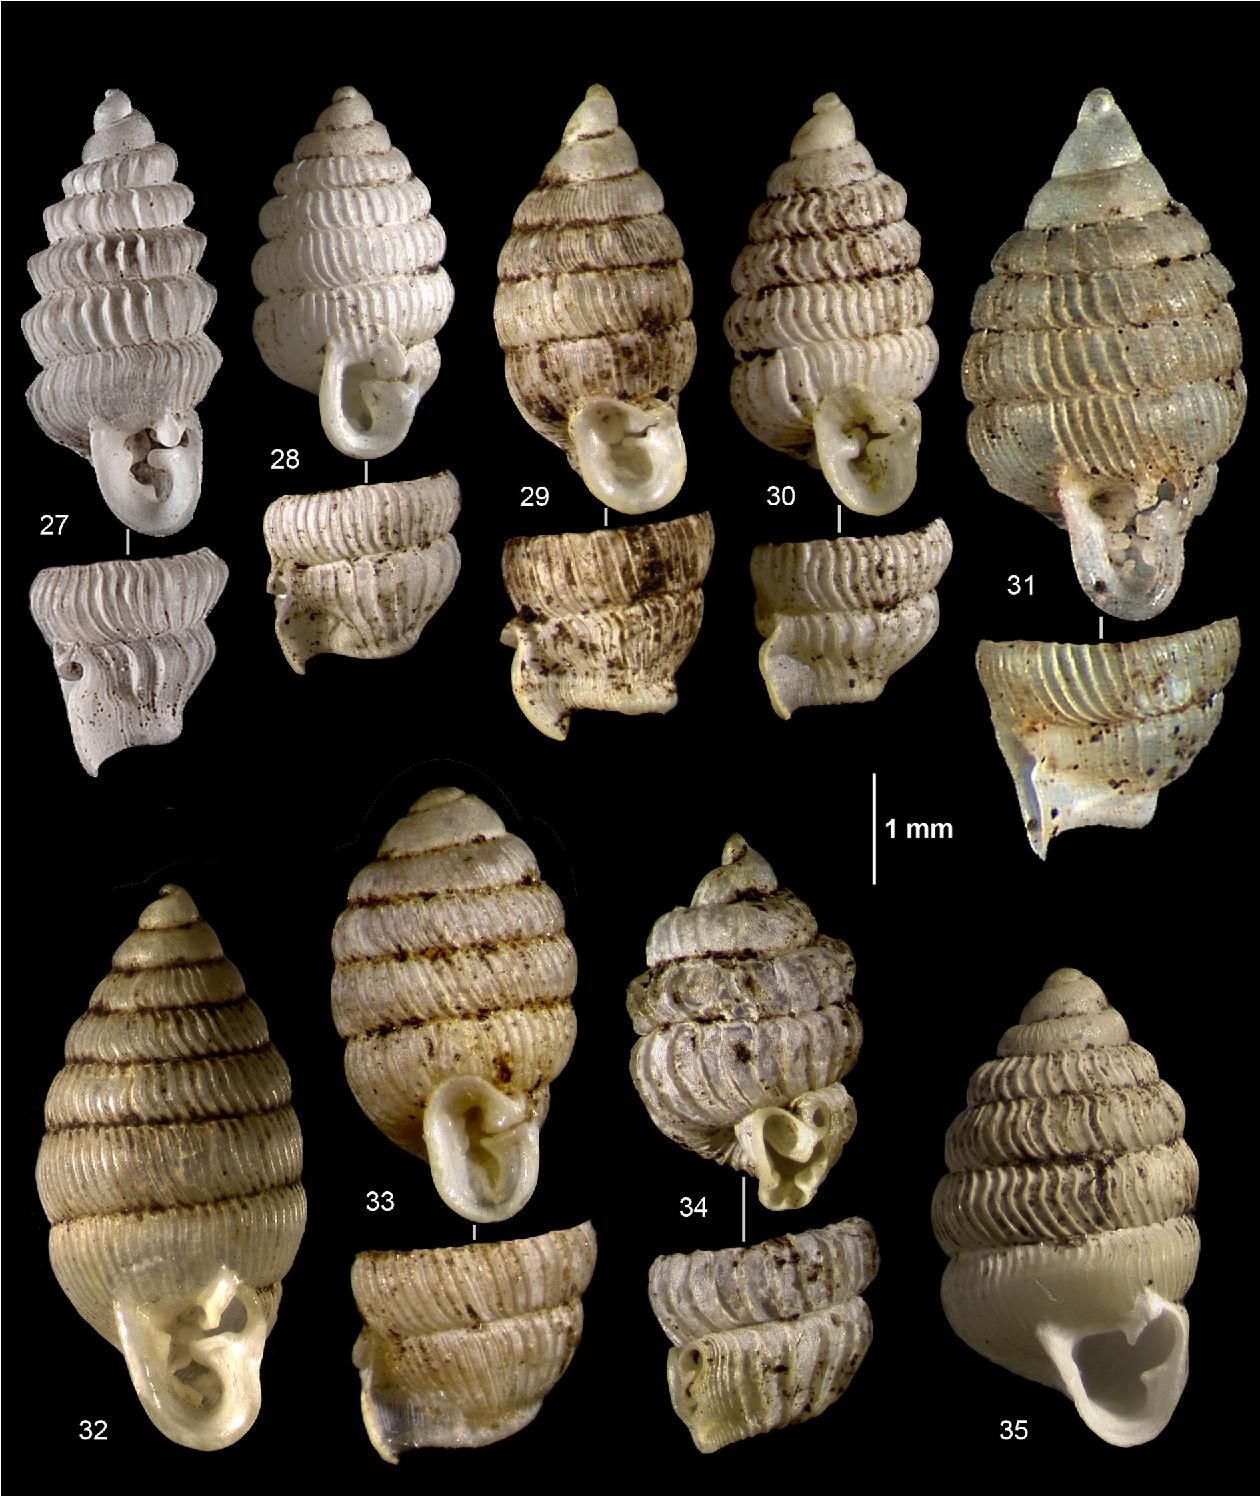 figure 27-35